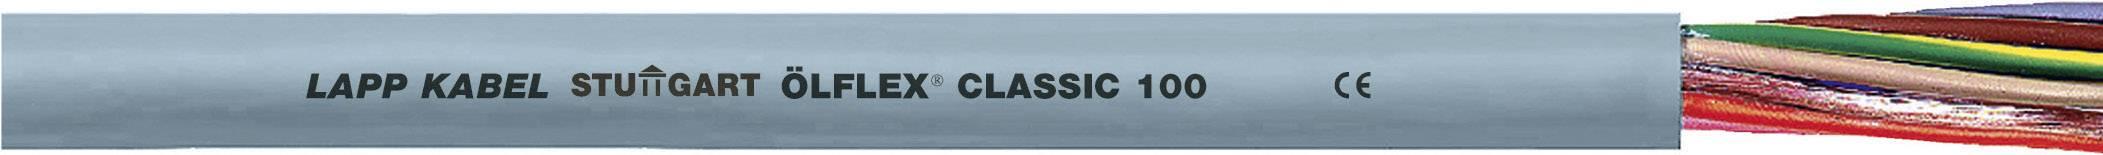 Kabel LappKabel Ölflex CLASSIC 100 5G25 (00101163), PVC, 28,5 mm, 750 V, šedá, 500 m